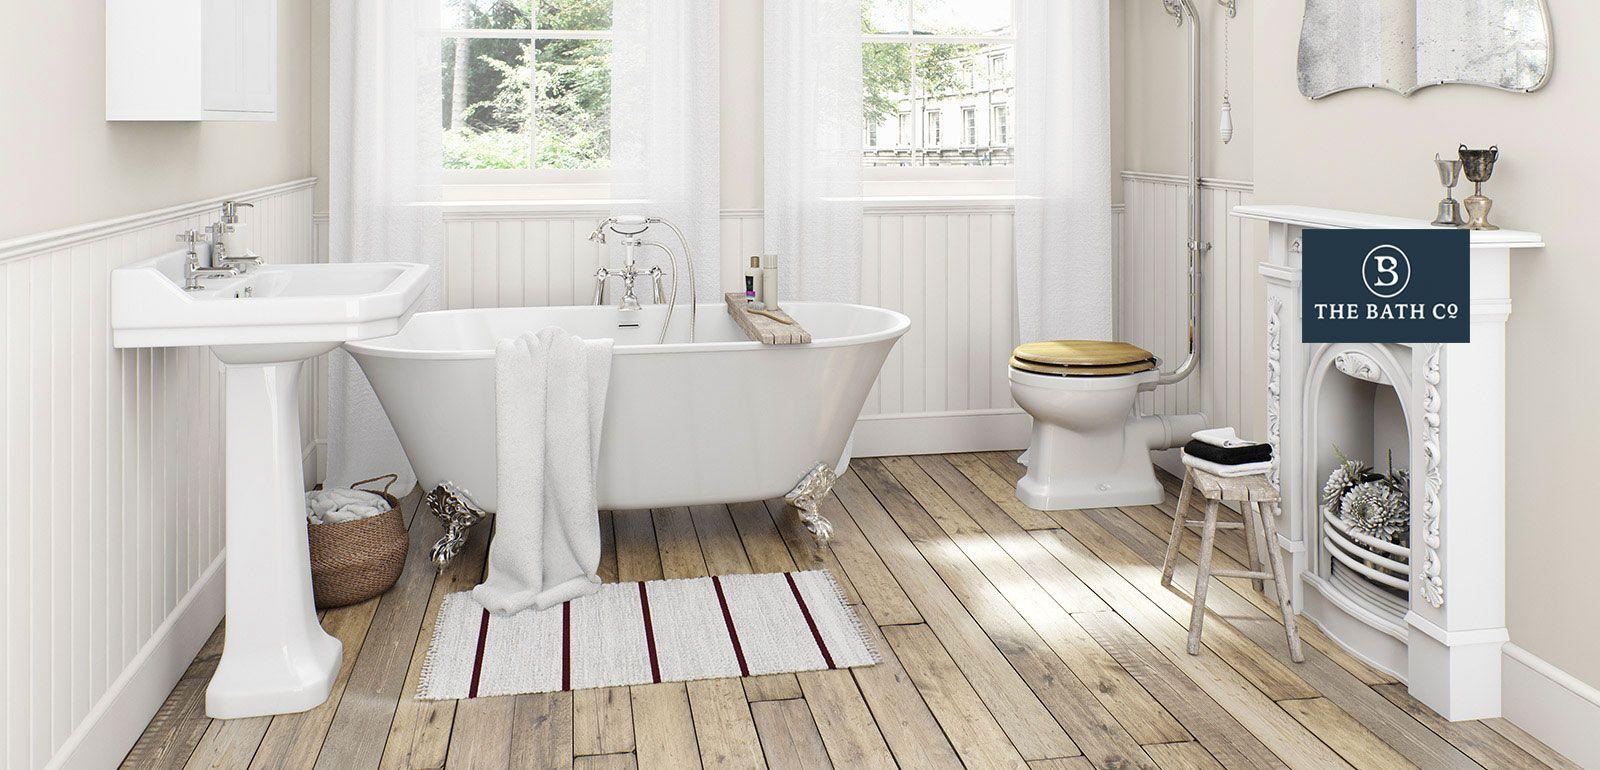 Camberley Bathroom Suite Range | Favourite bathrooms | Pinterest ...